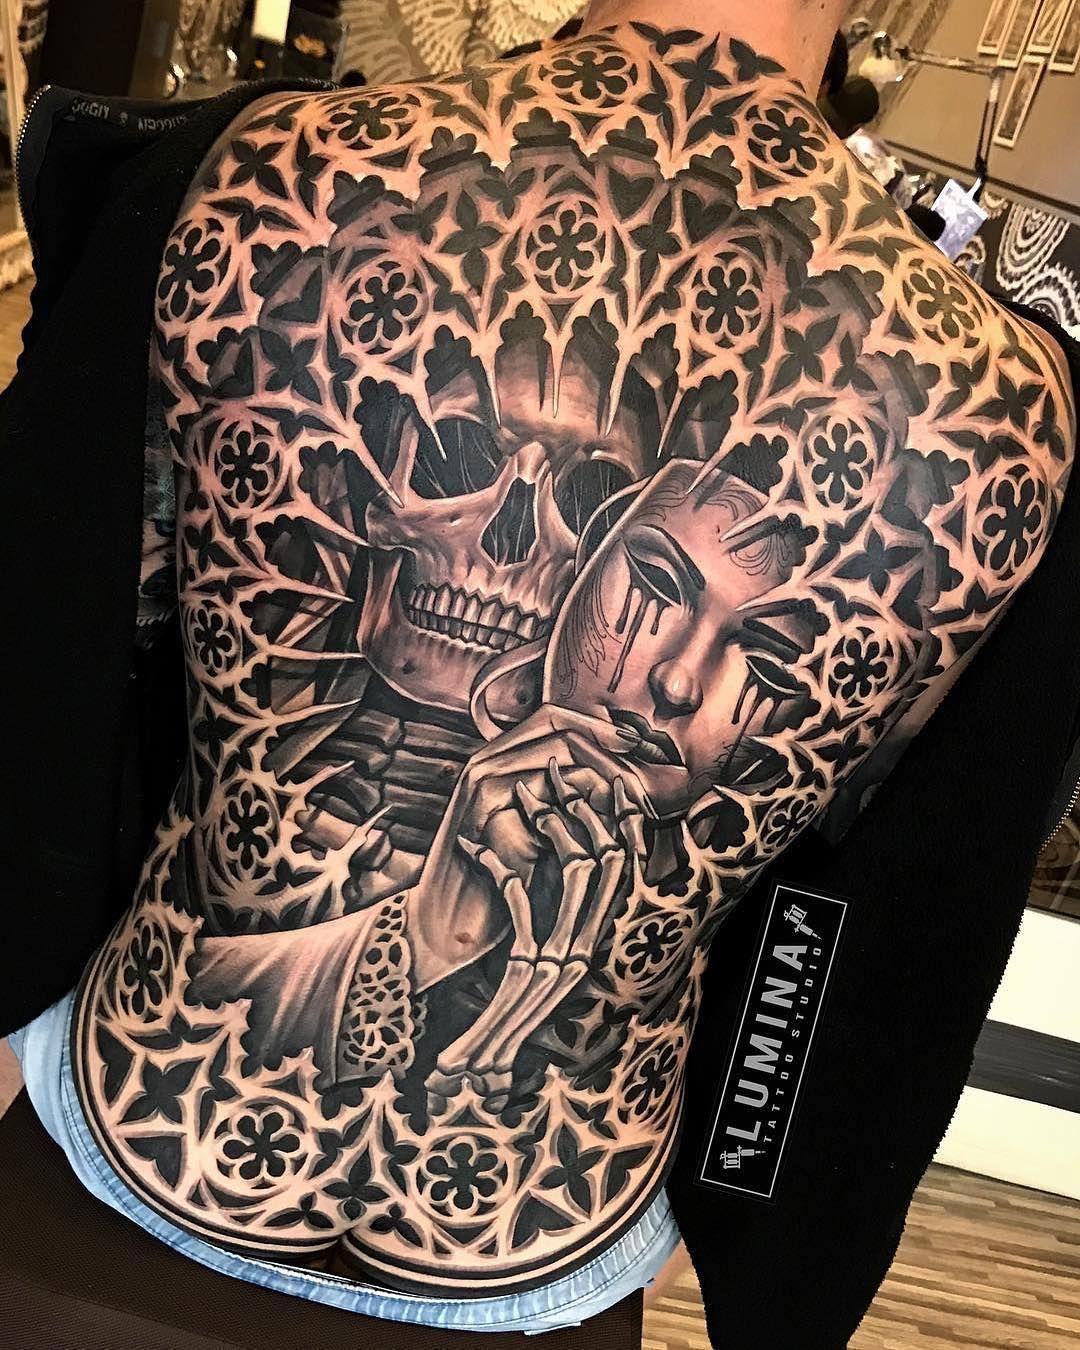 Top 50 Badass Tattoo Ideas And Designs For Men tattoos